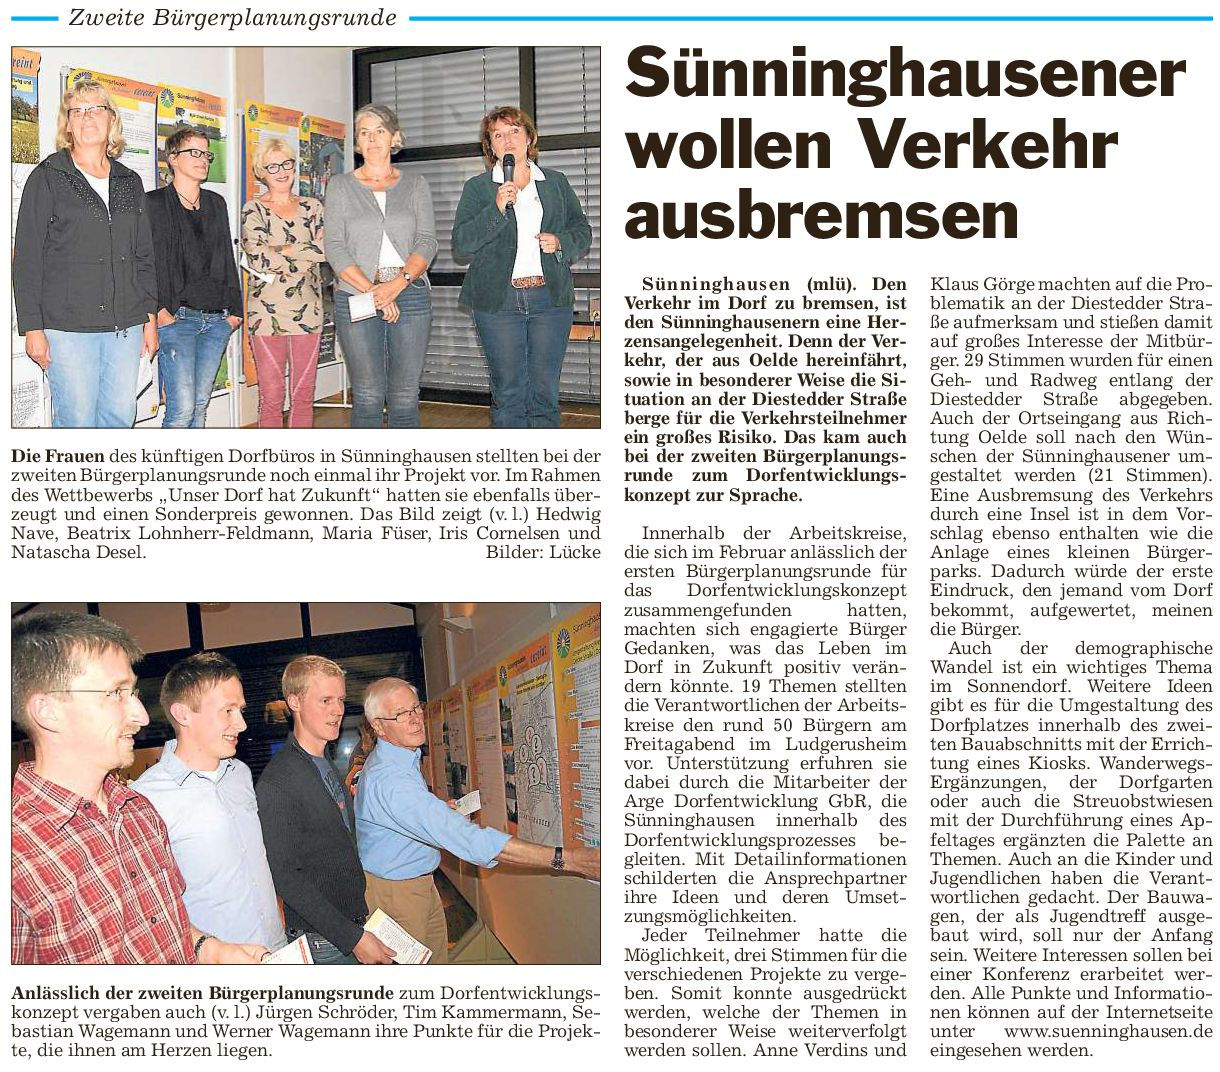 2. Bürgerplanungsrunde in Sünninghausen